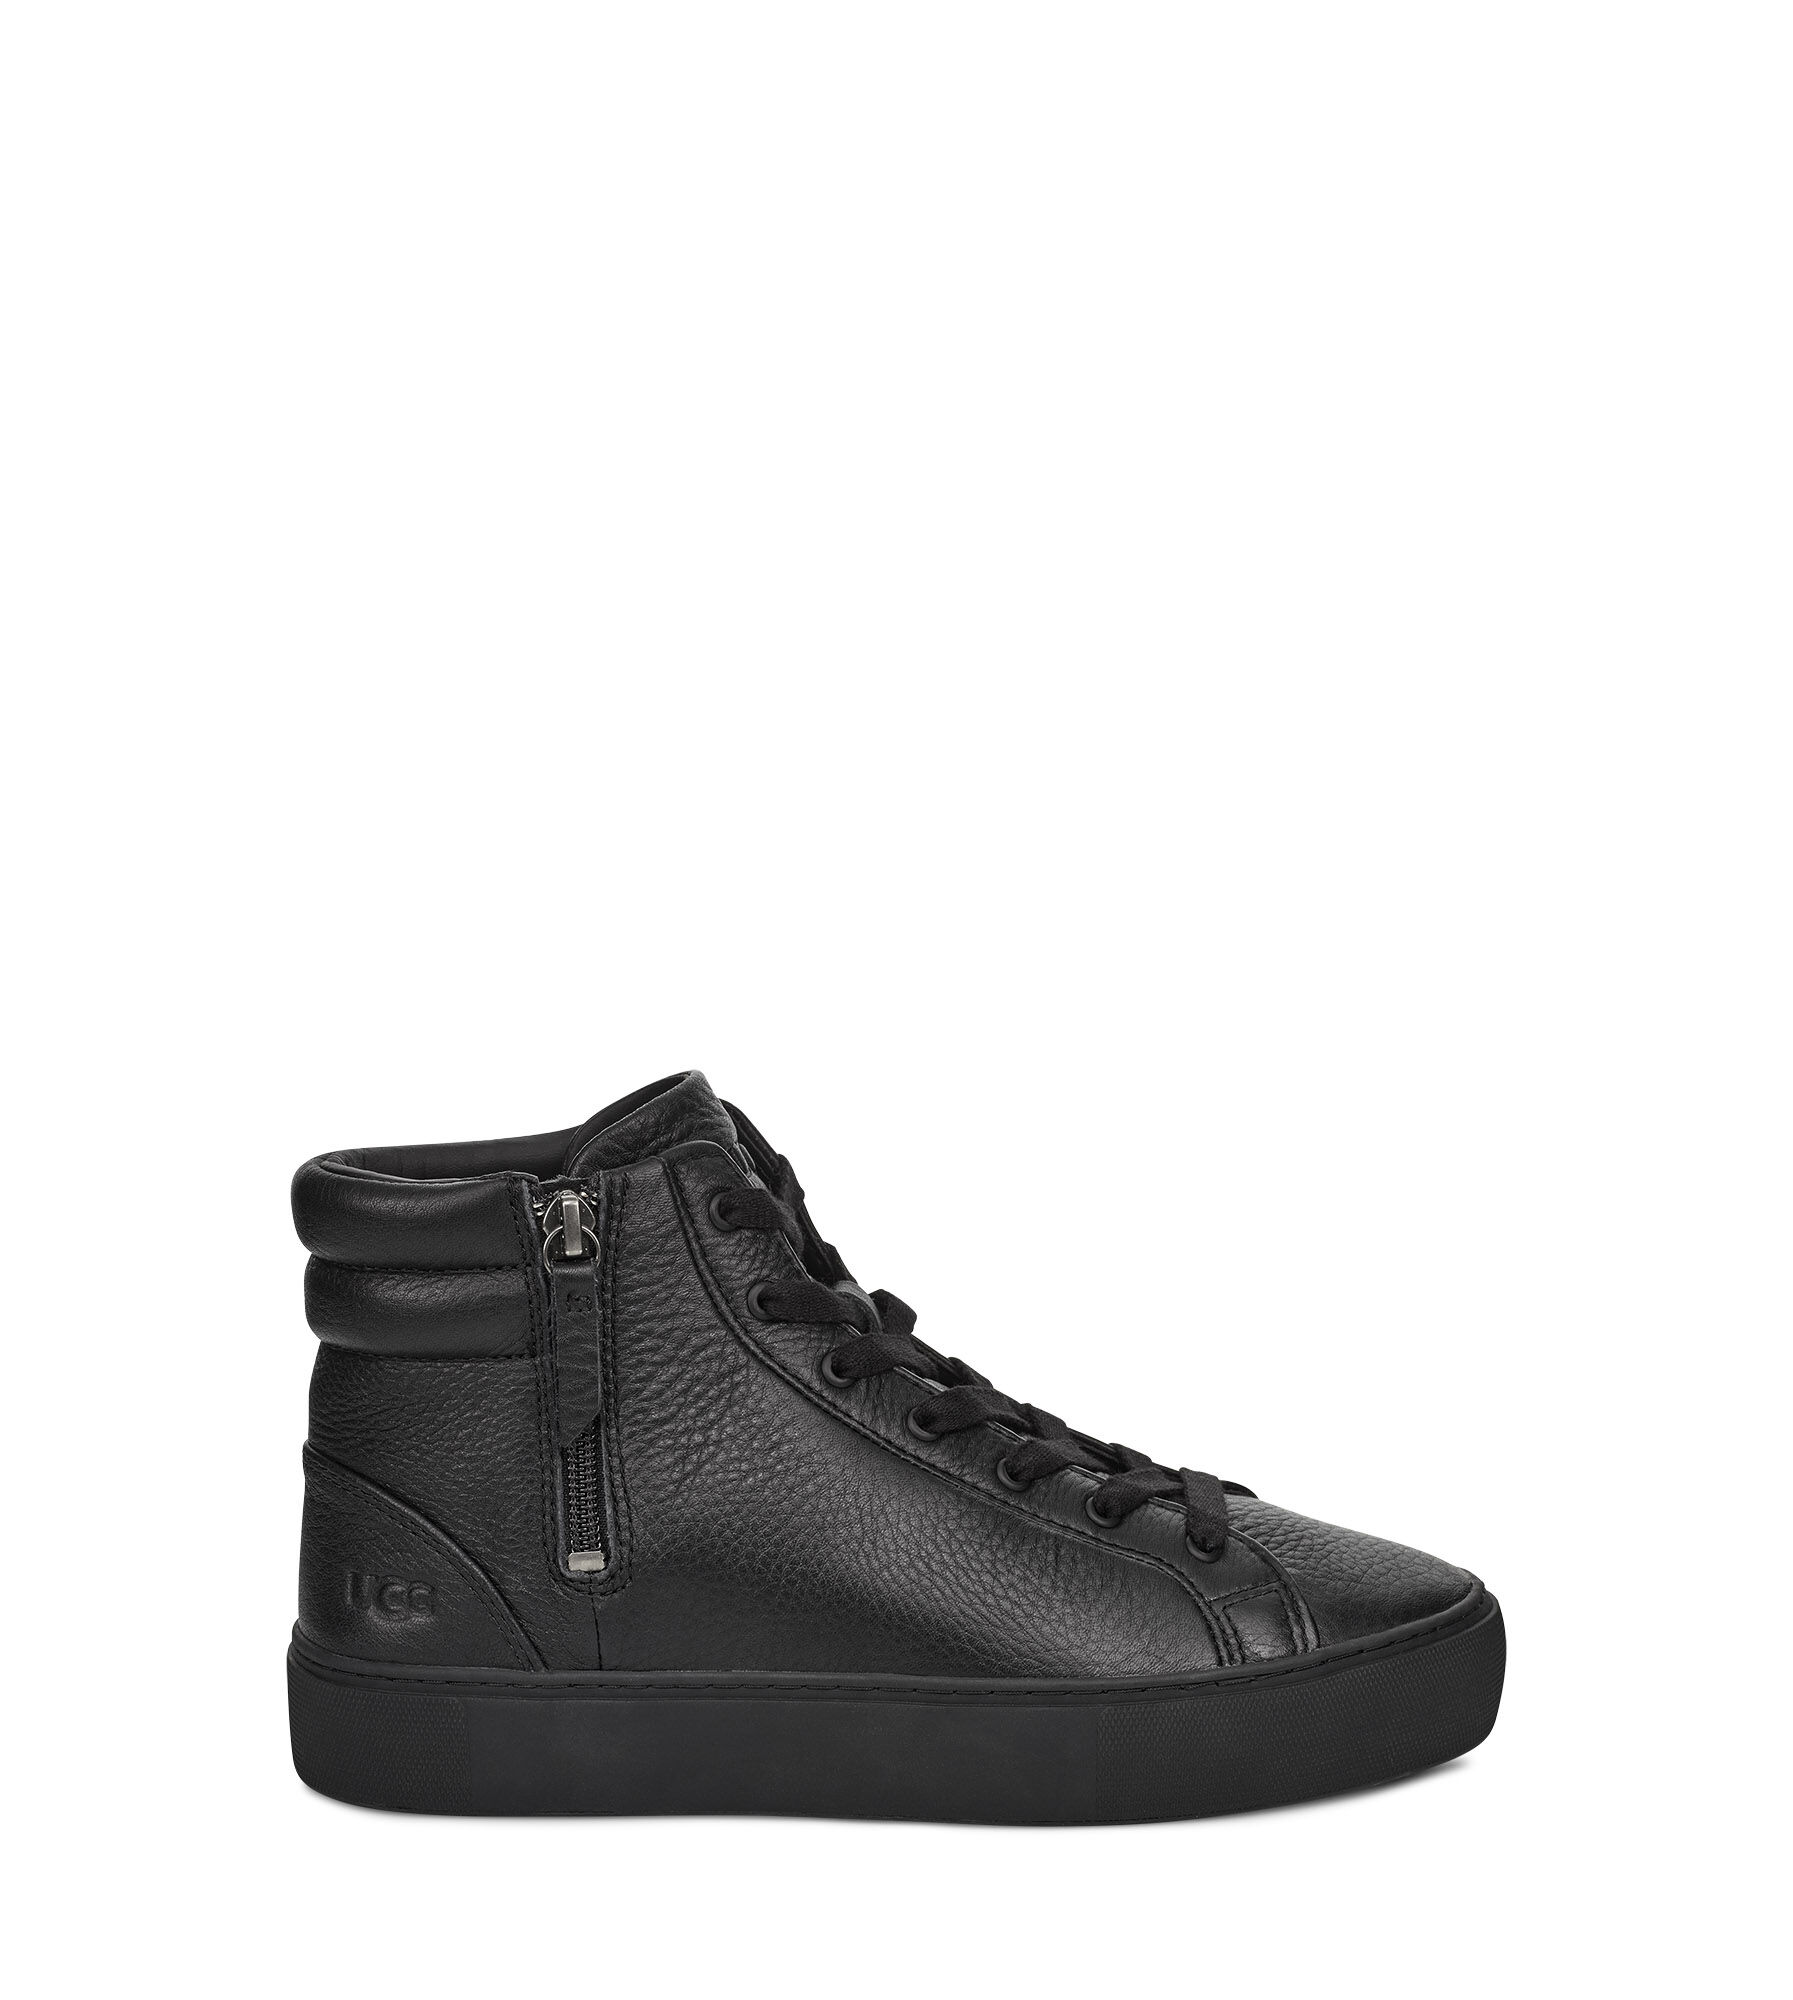 Olli Leather Hi Top Trainers Black